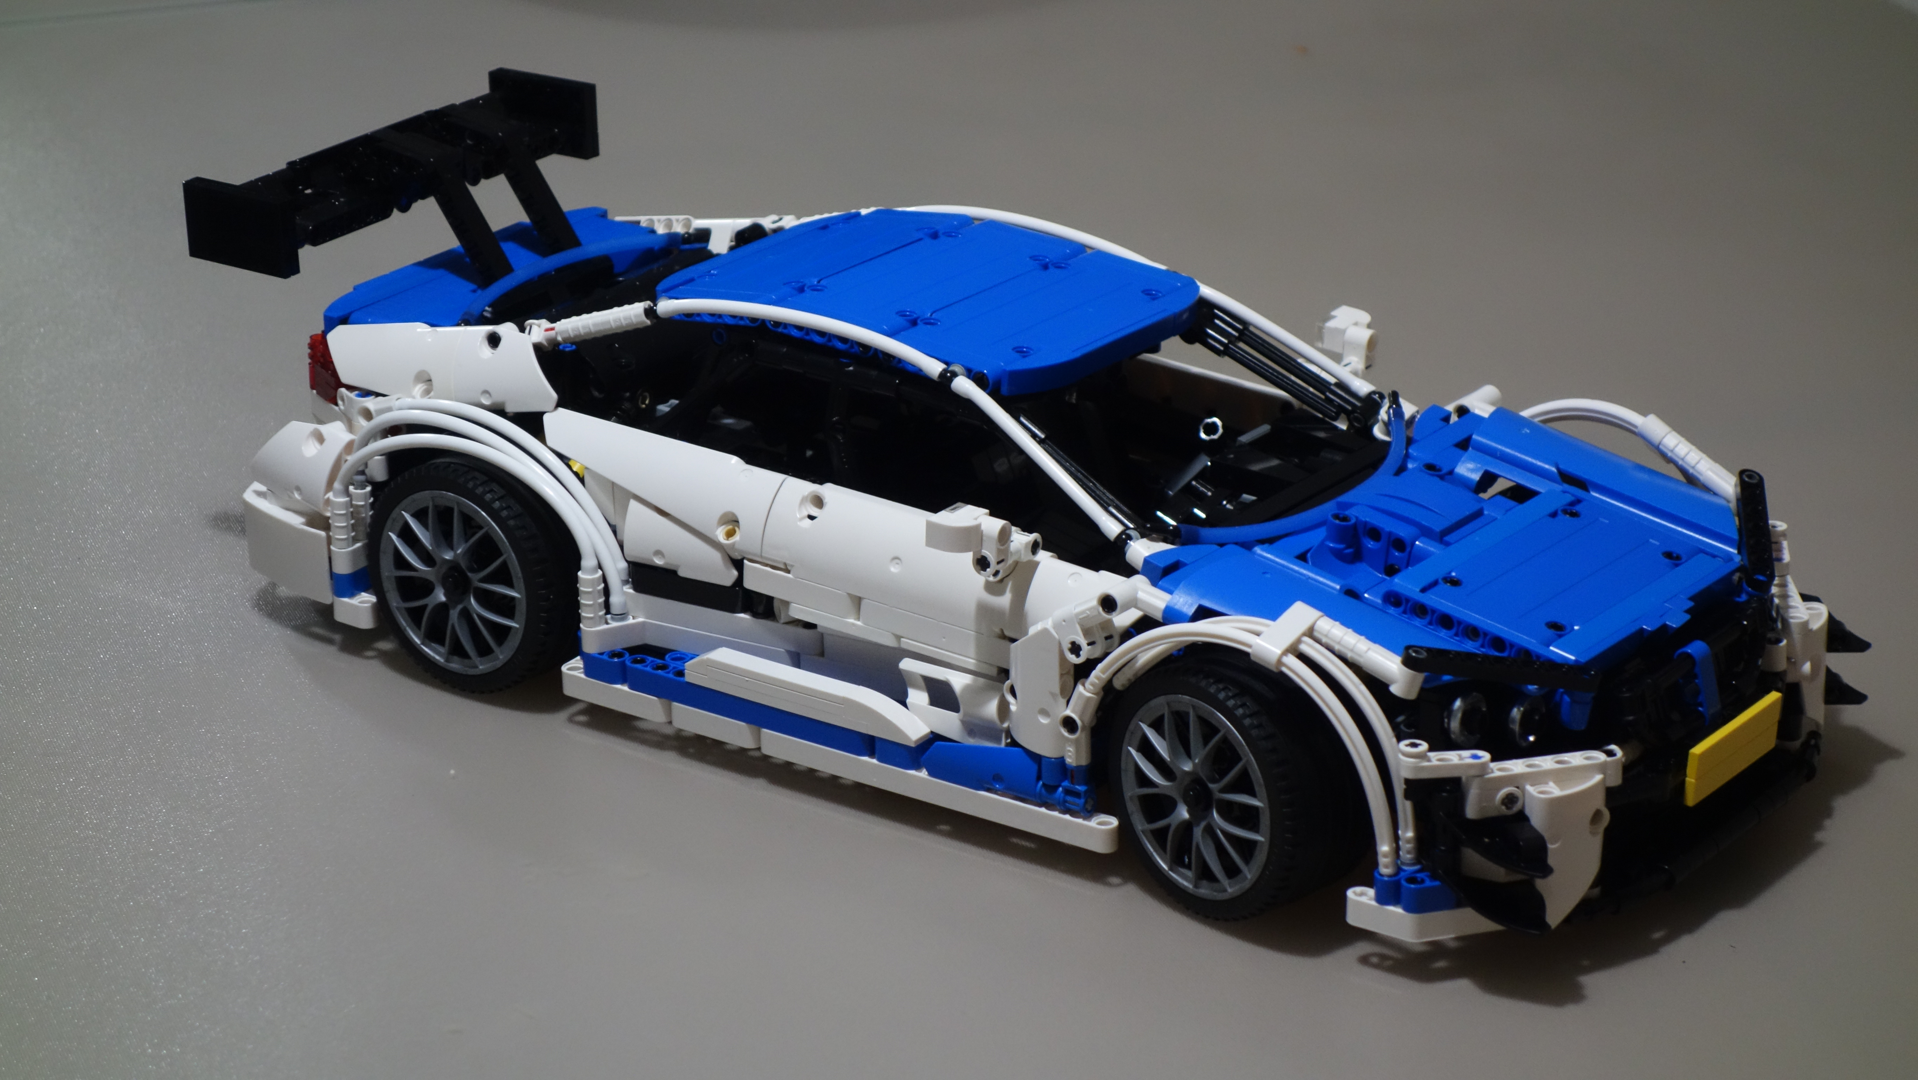 Lego Moc 4339 Bmw M4 Dtm Samsung Technic 2016 Rebrickable